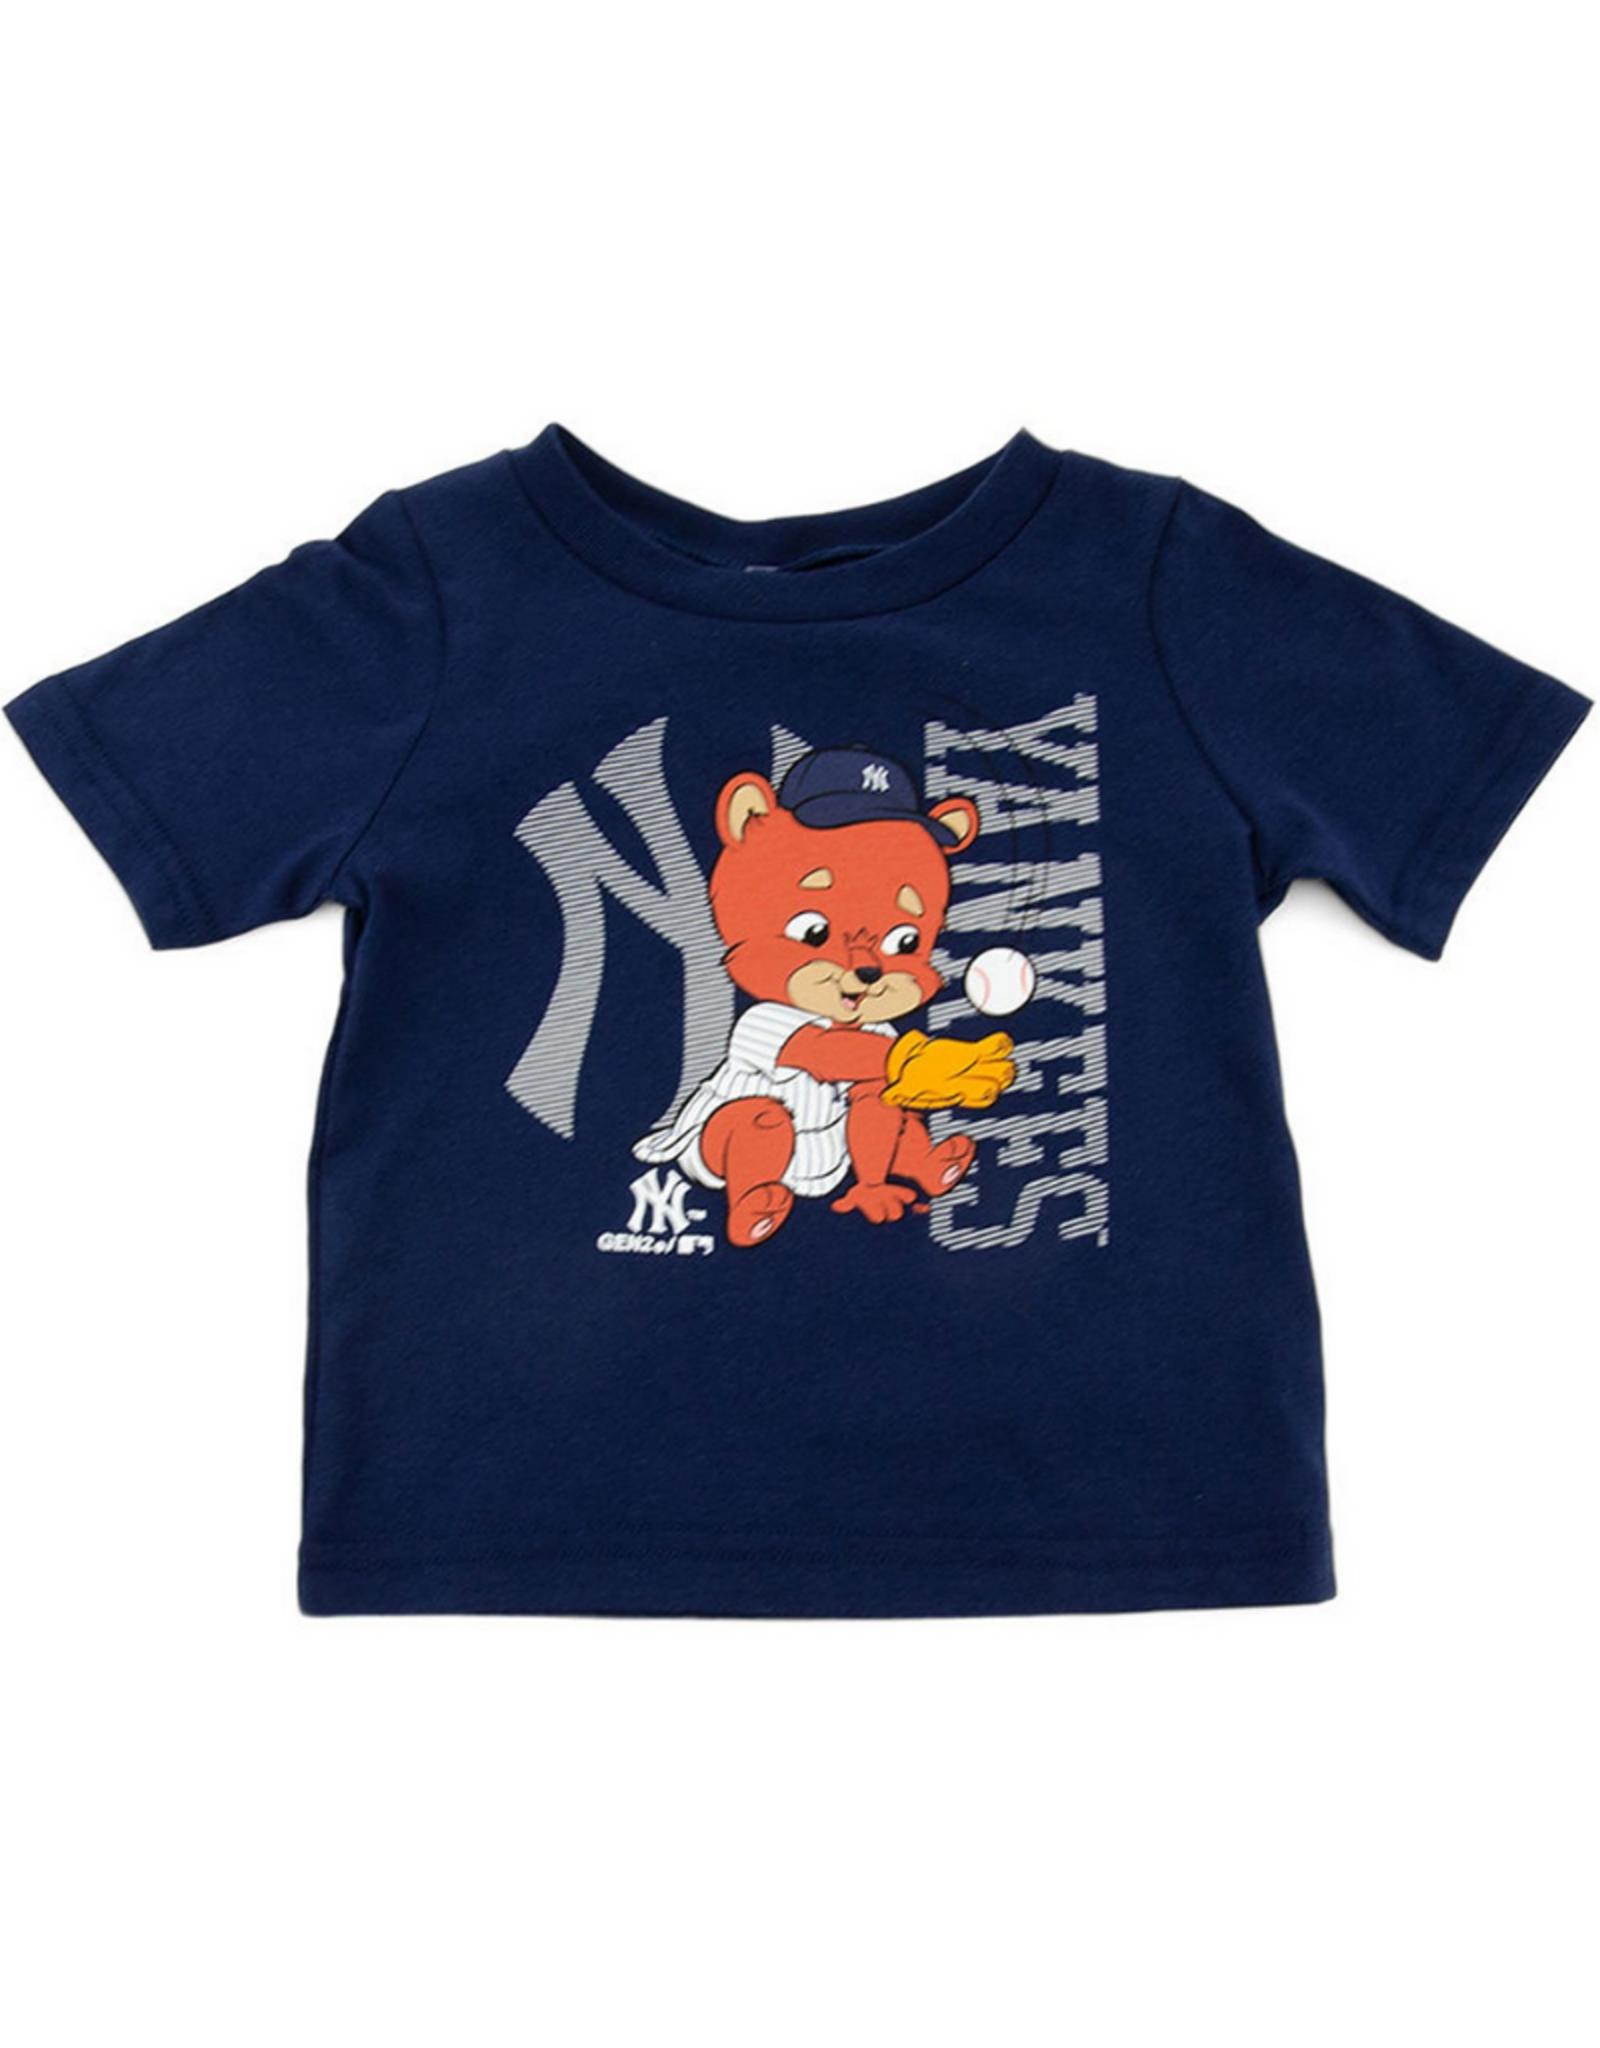 MLB Infant Baby Mascot T-Shirt New York Yankees